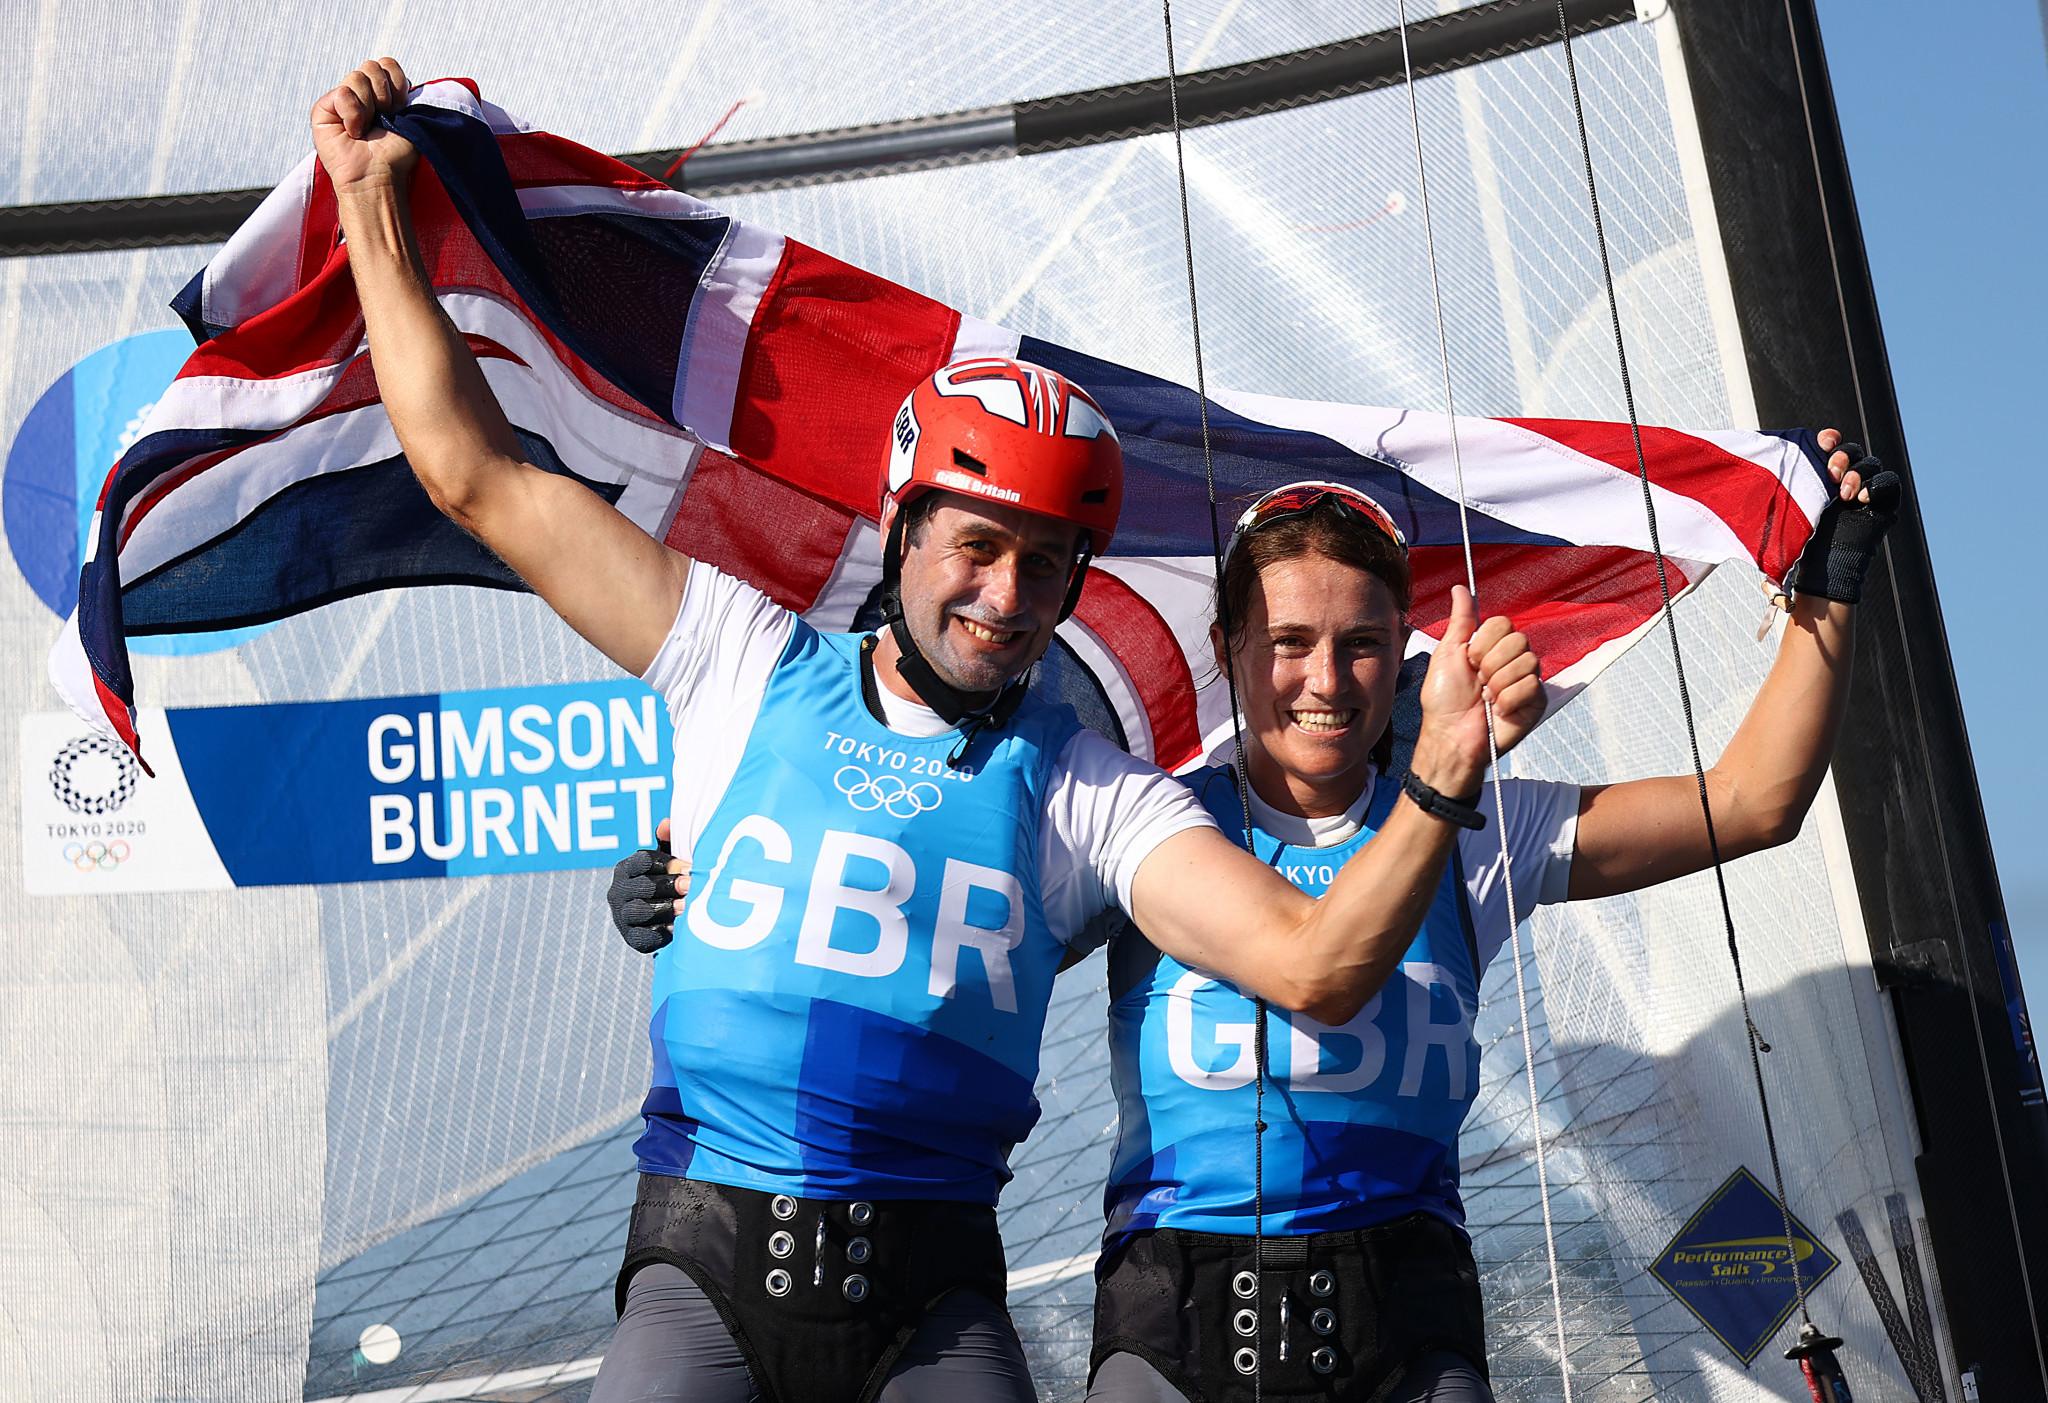 Gimson and Burnet maintain lead in Nacra 17 at European Championship